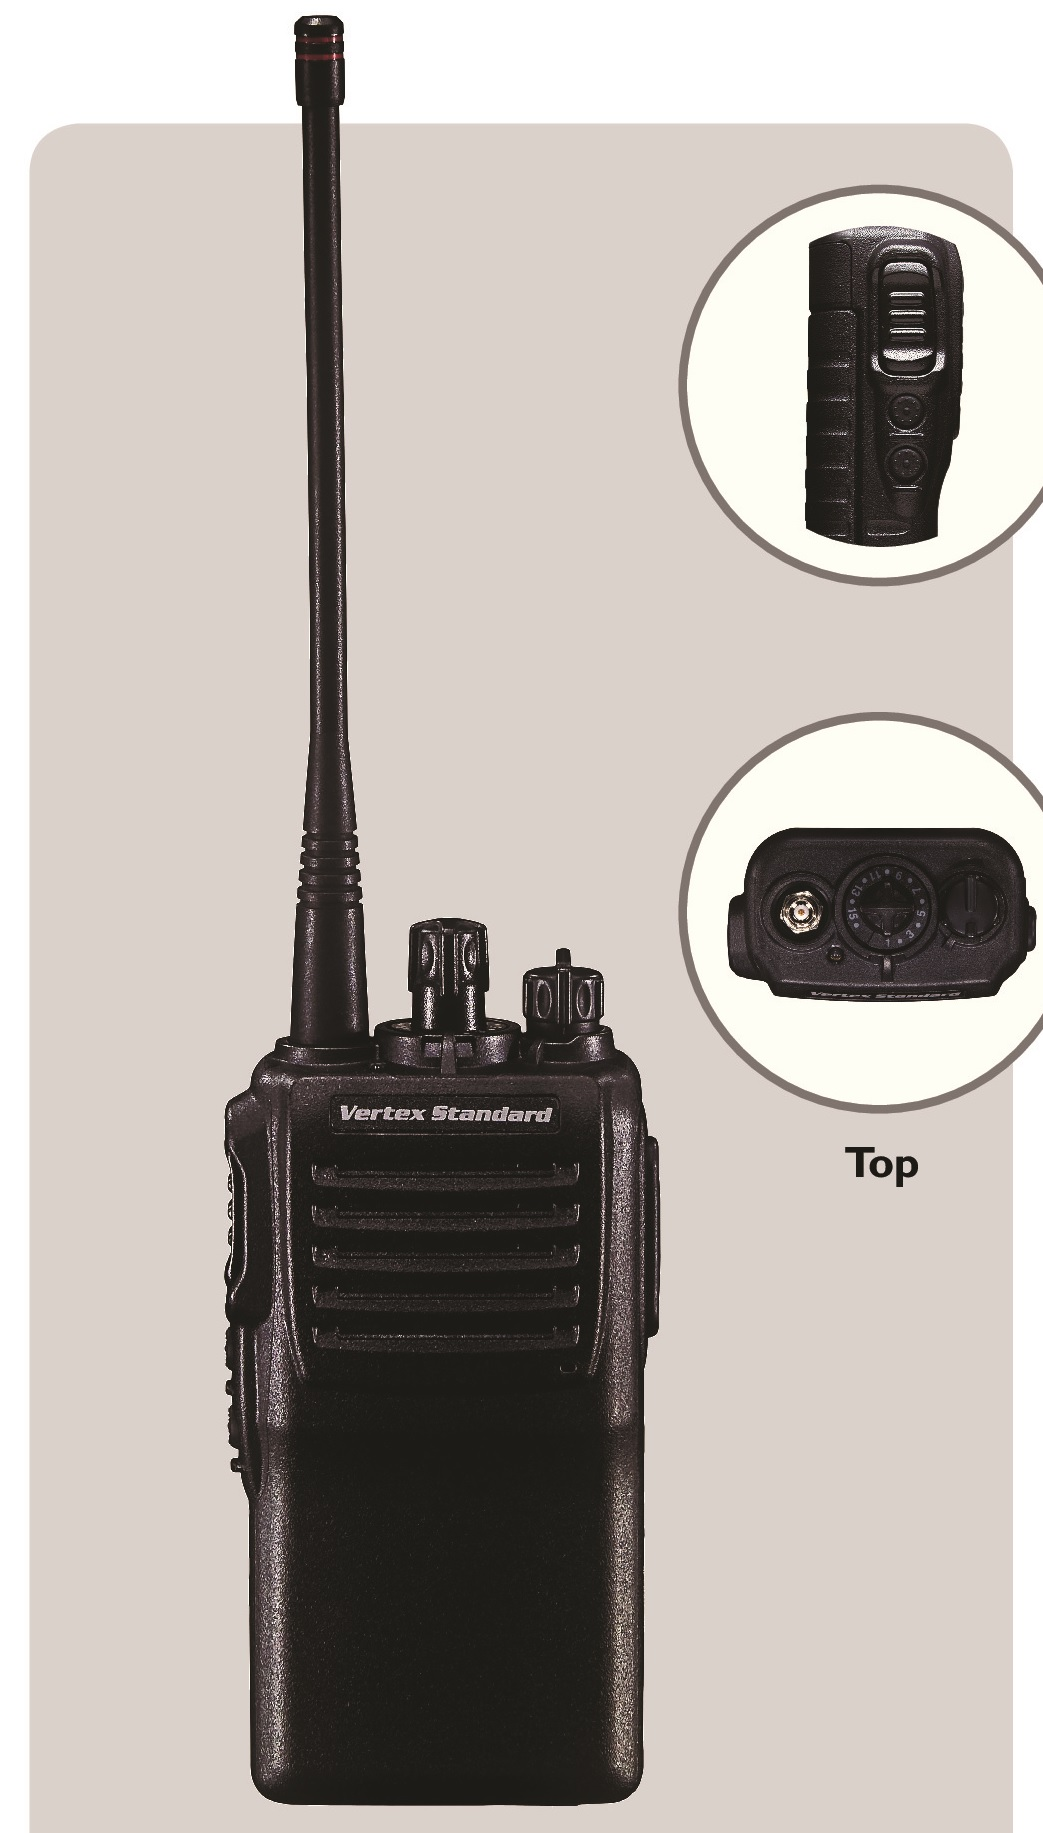 Vertex VX-230 Portable two way radio VHF UHF